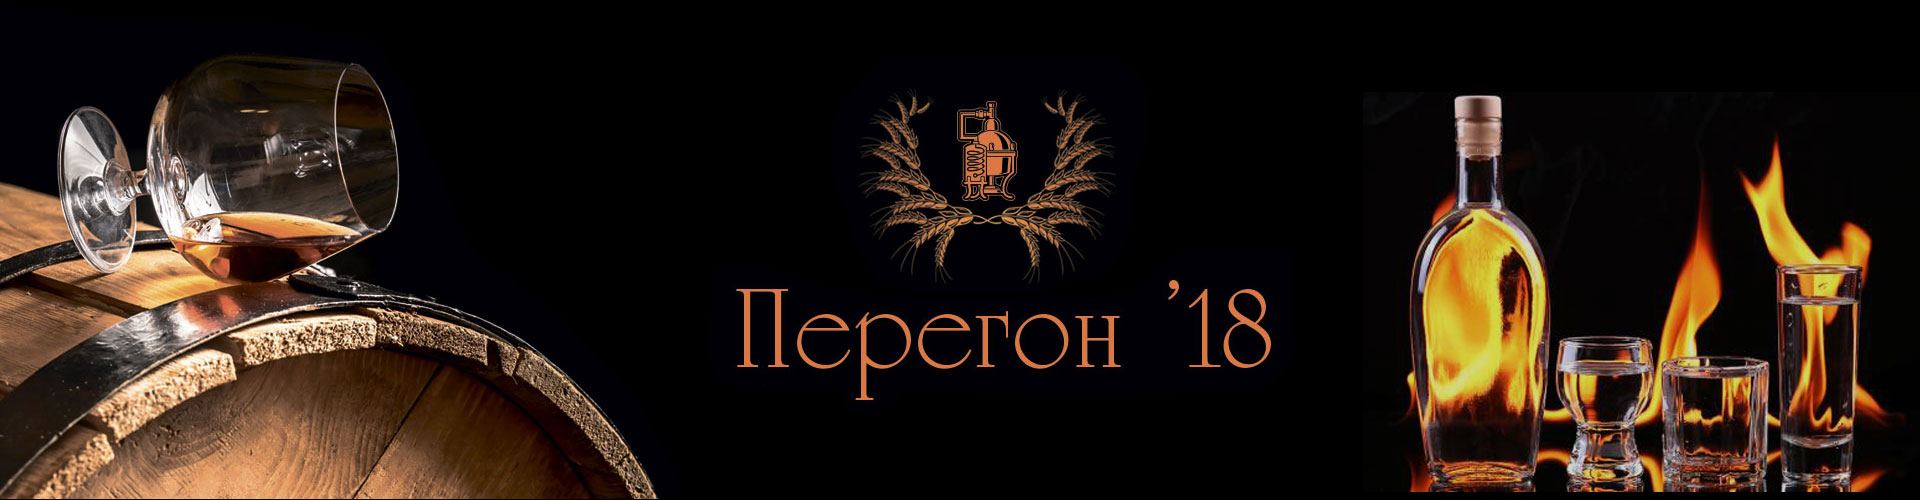 01-logo-01